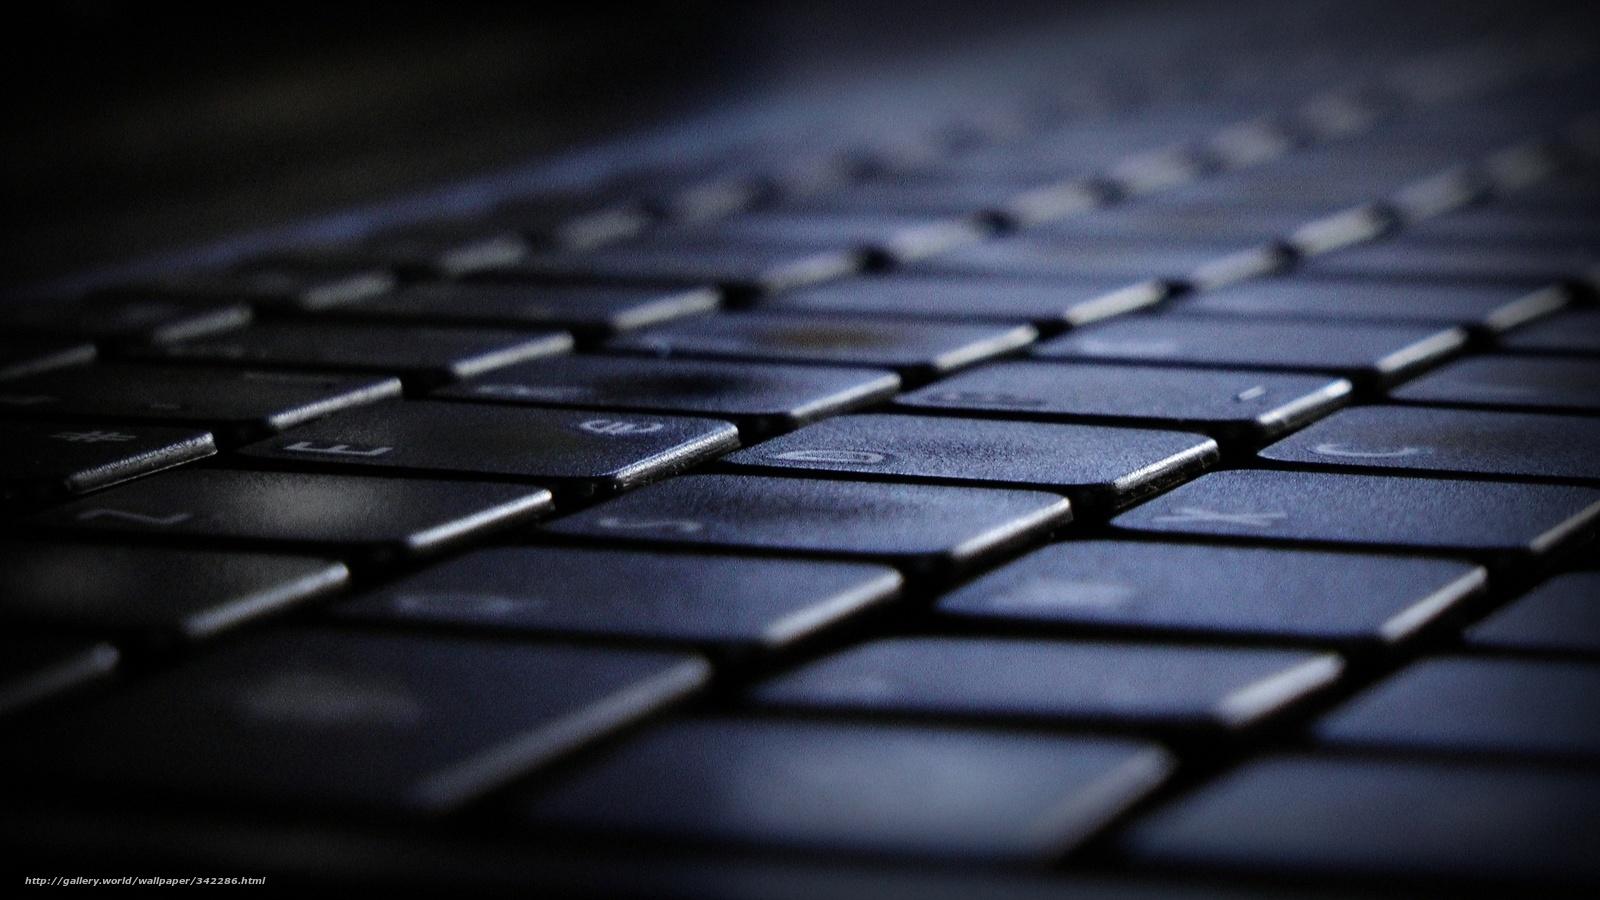 Download Wallpaper Keys, Computer, Keyboard Free Desktop